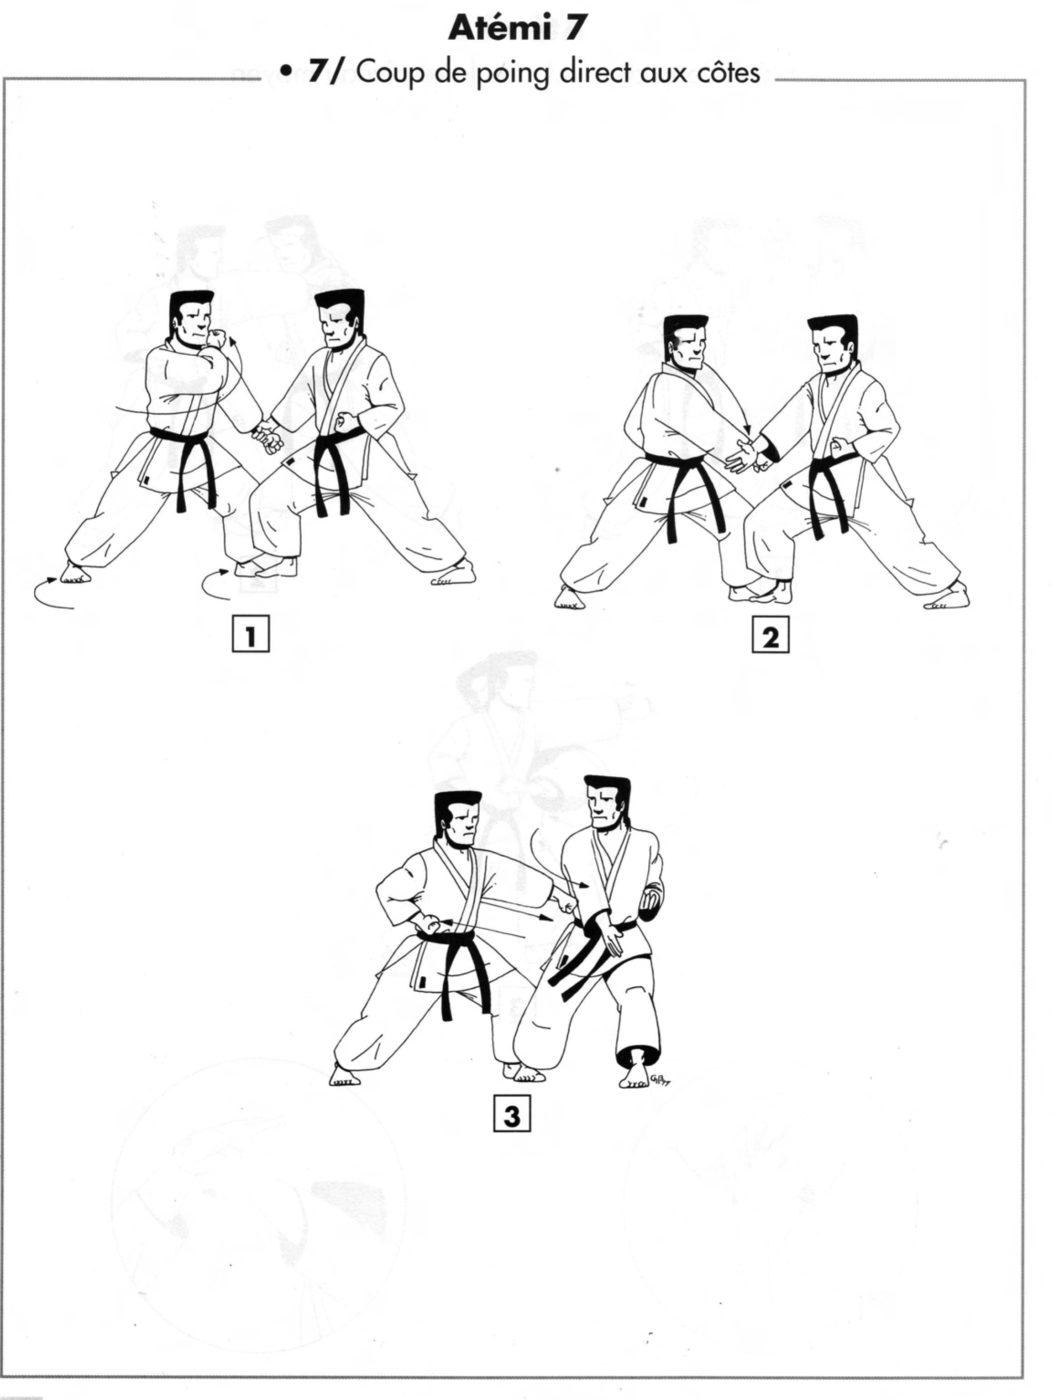 Atemi : chudan kimazi tsuki – coup de poing direct aux côtes